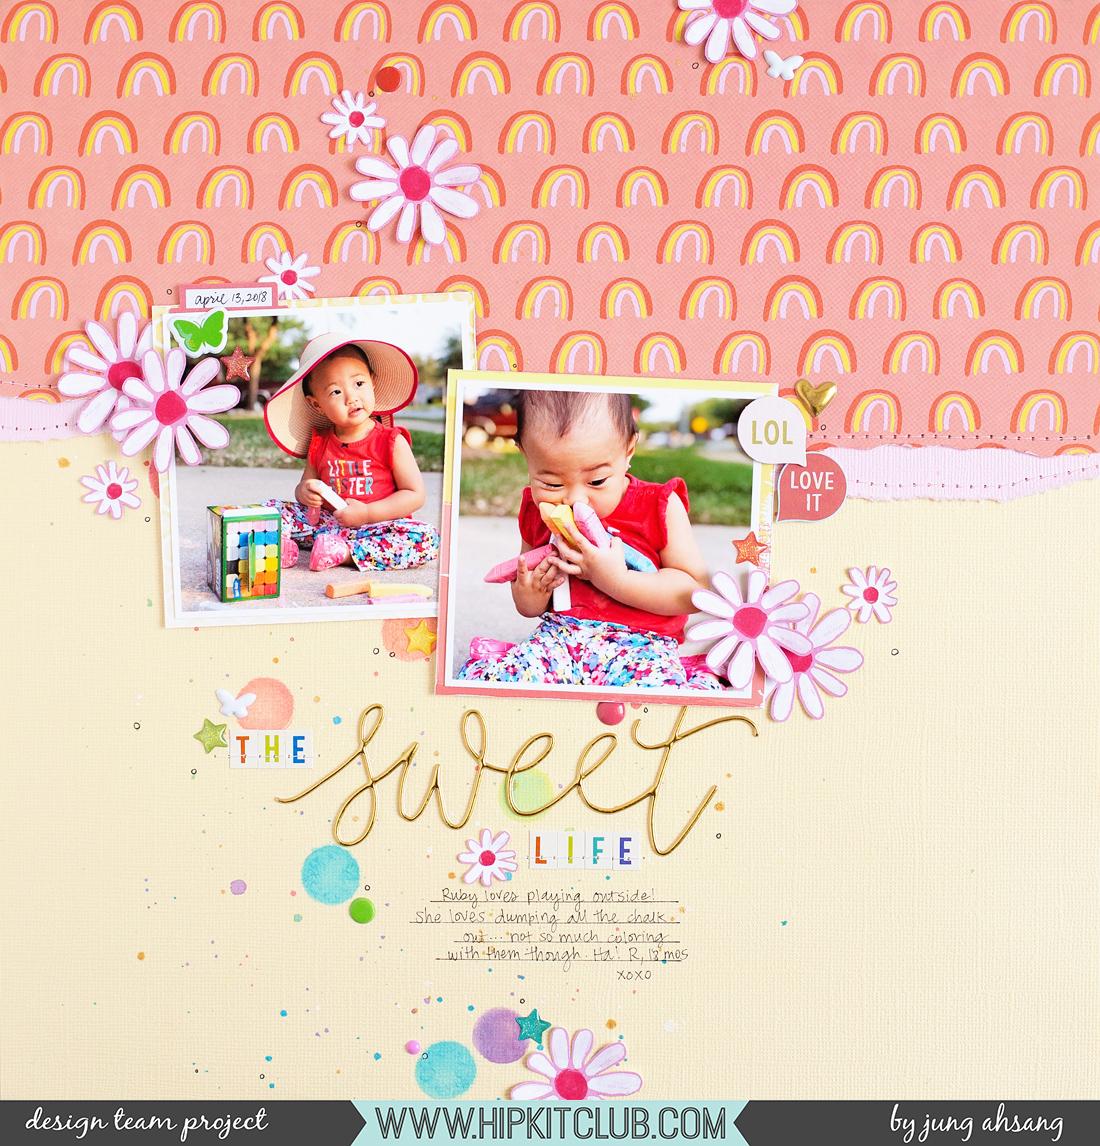 ahsang HKC sweetlife 1